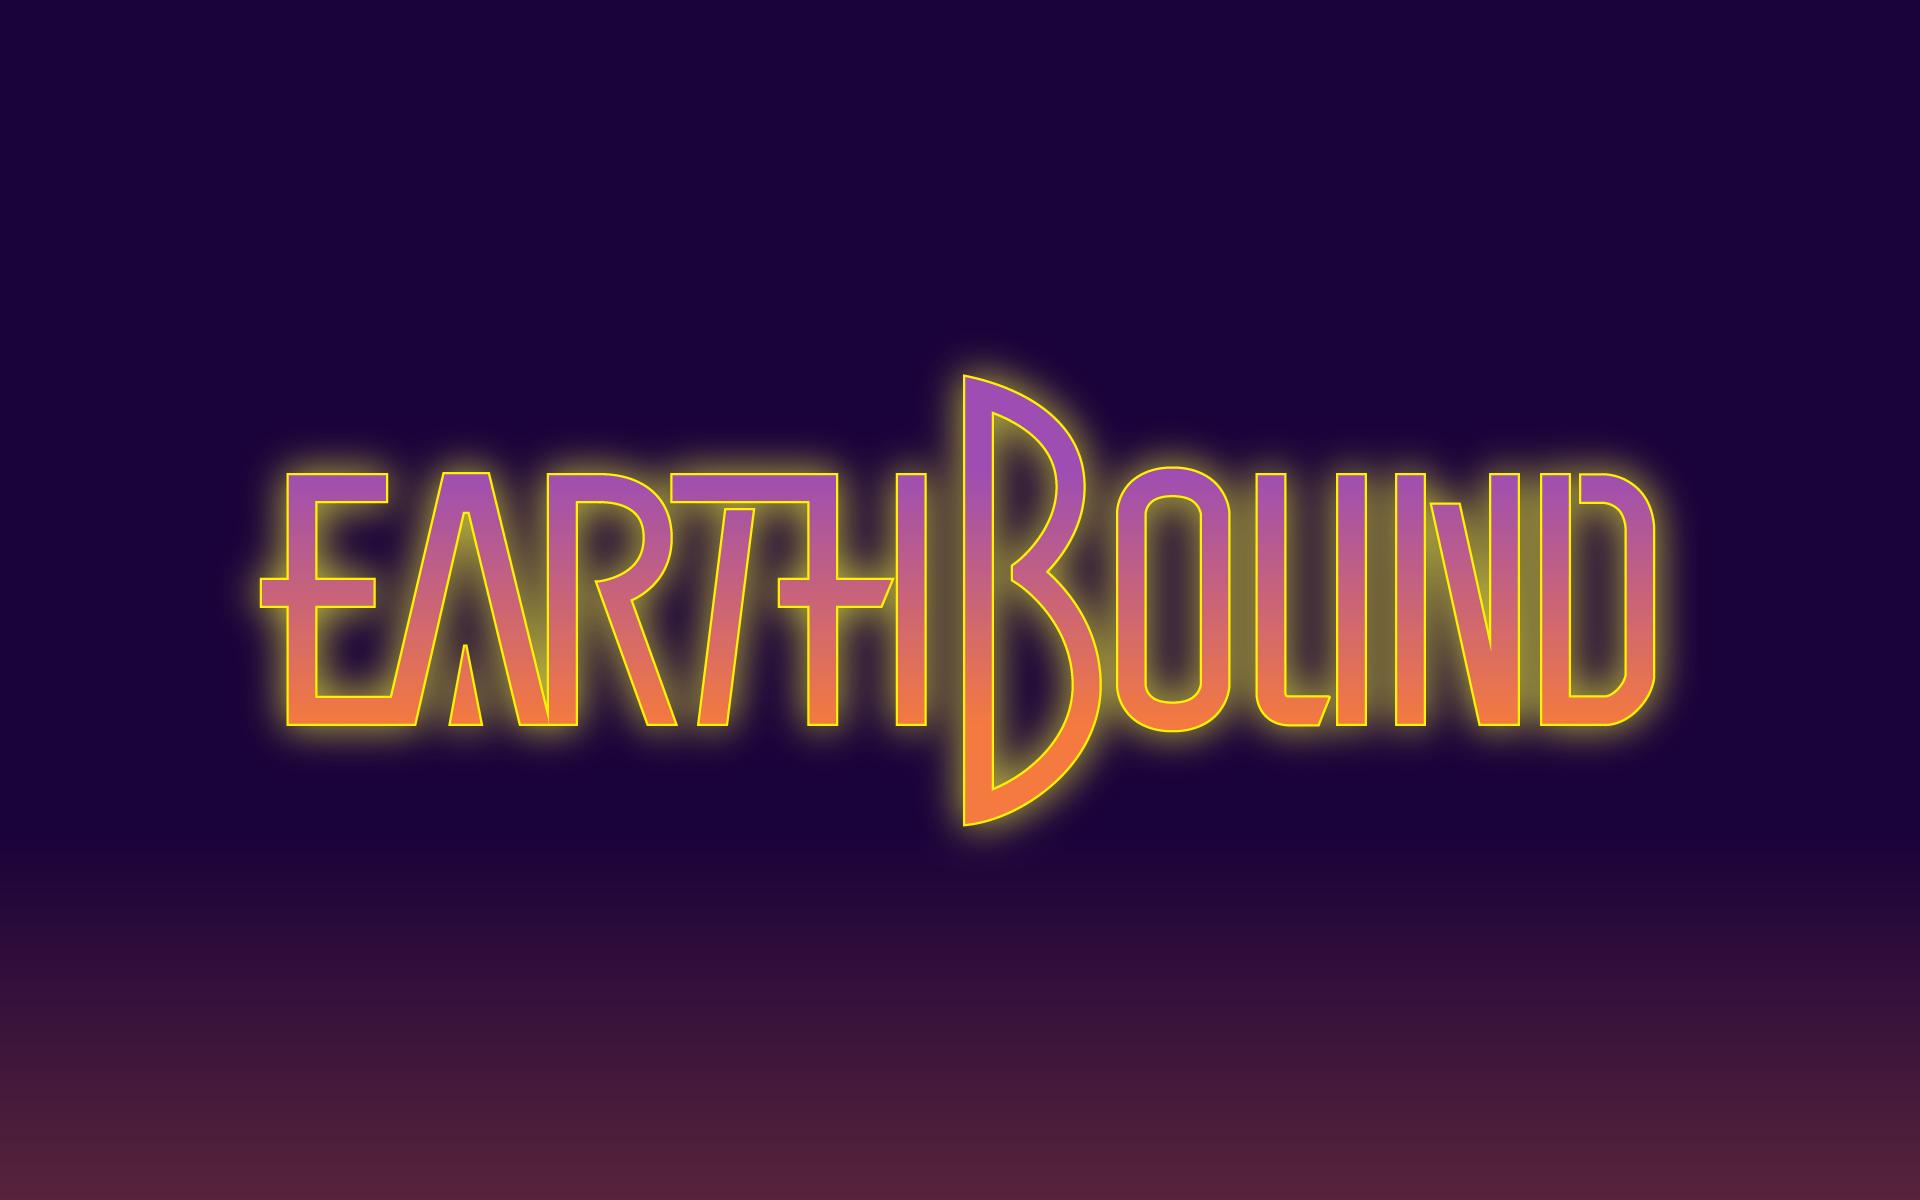 Earthbound   Desktop Wallpapers 1920x1200